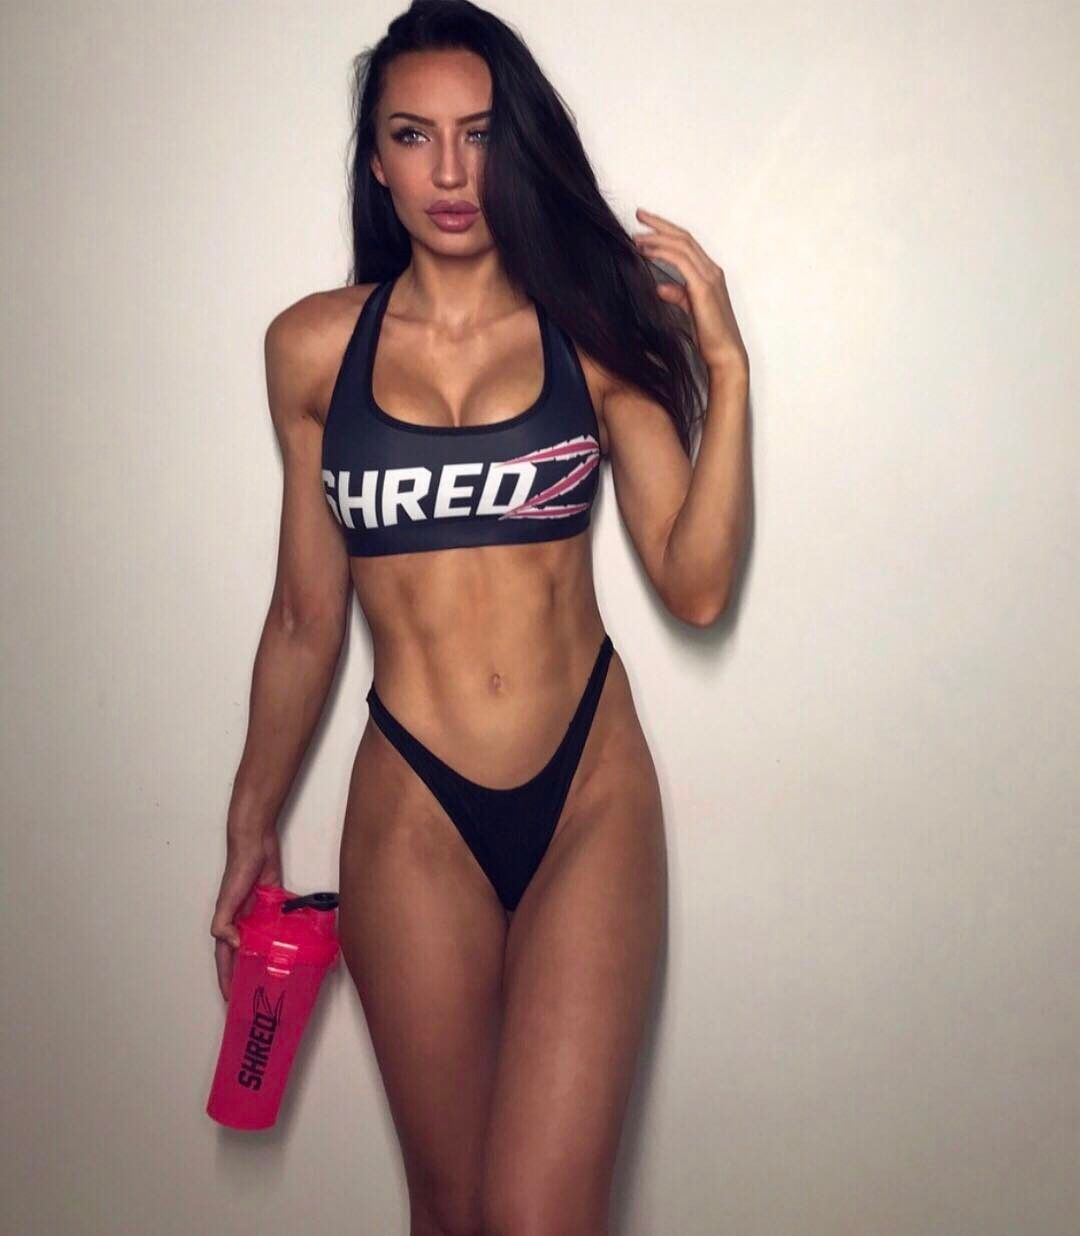 Hacked Sanna-Maria Seilamo nudes (15 photos), Topless, Hot, Instagram, butt 2020